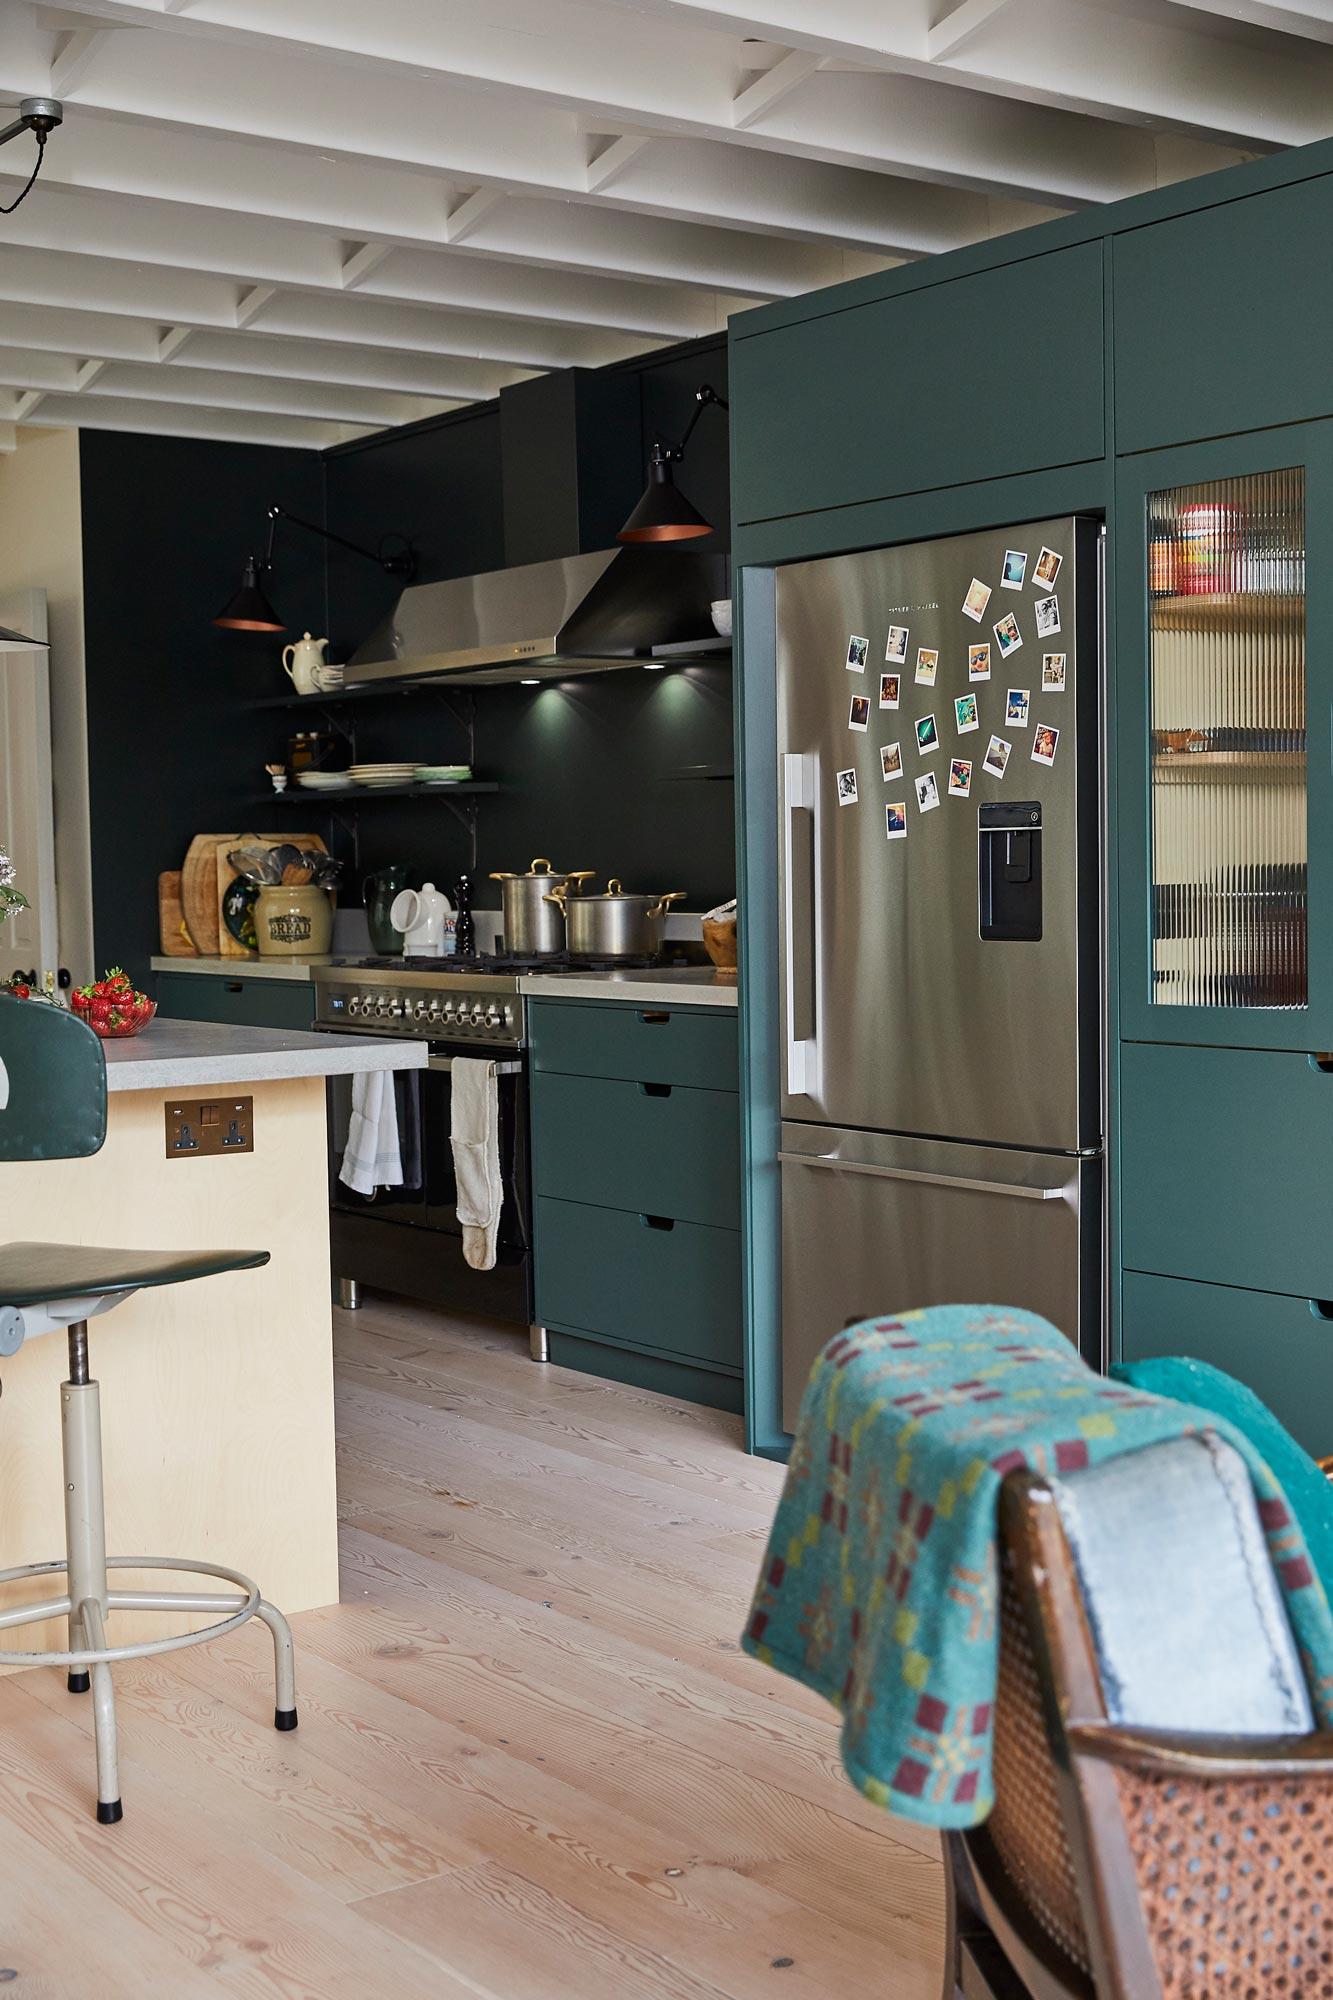 Freestanding stainless steel Fisher & Paykel fridge freezer in bespoke green kitchen